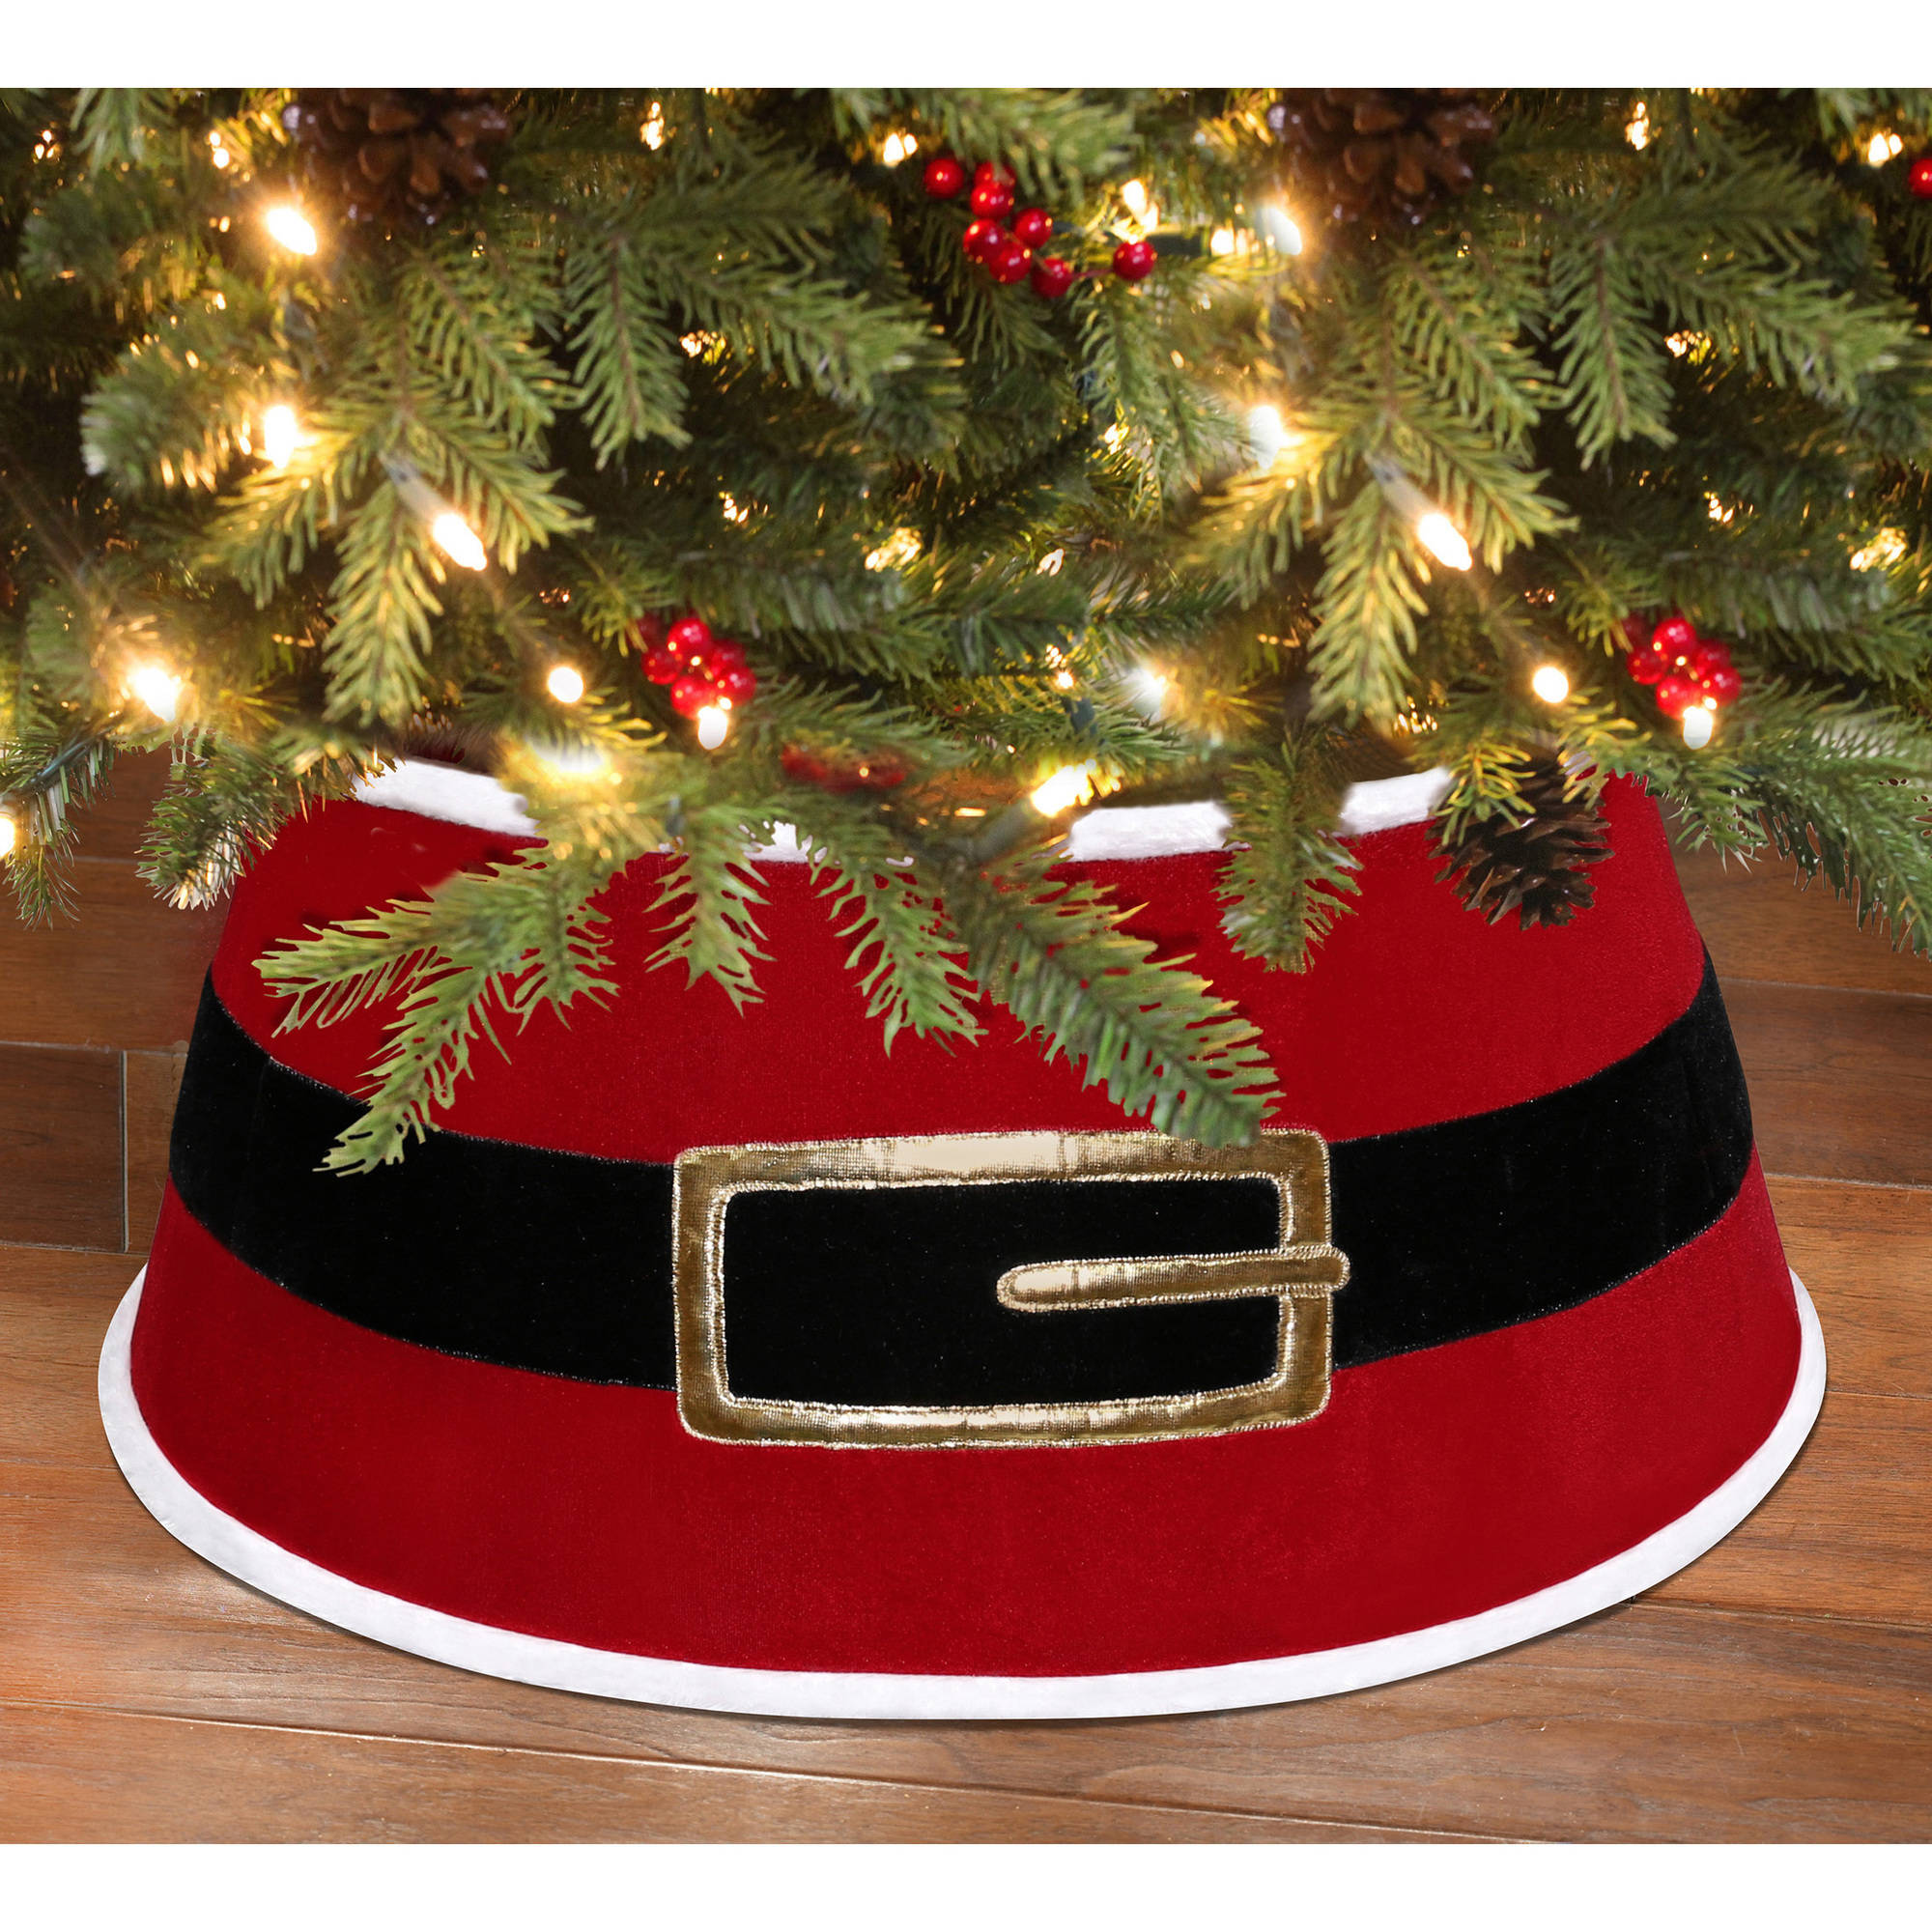 Christmas tree decorative stands diepedia